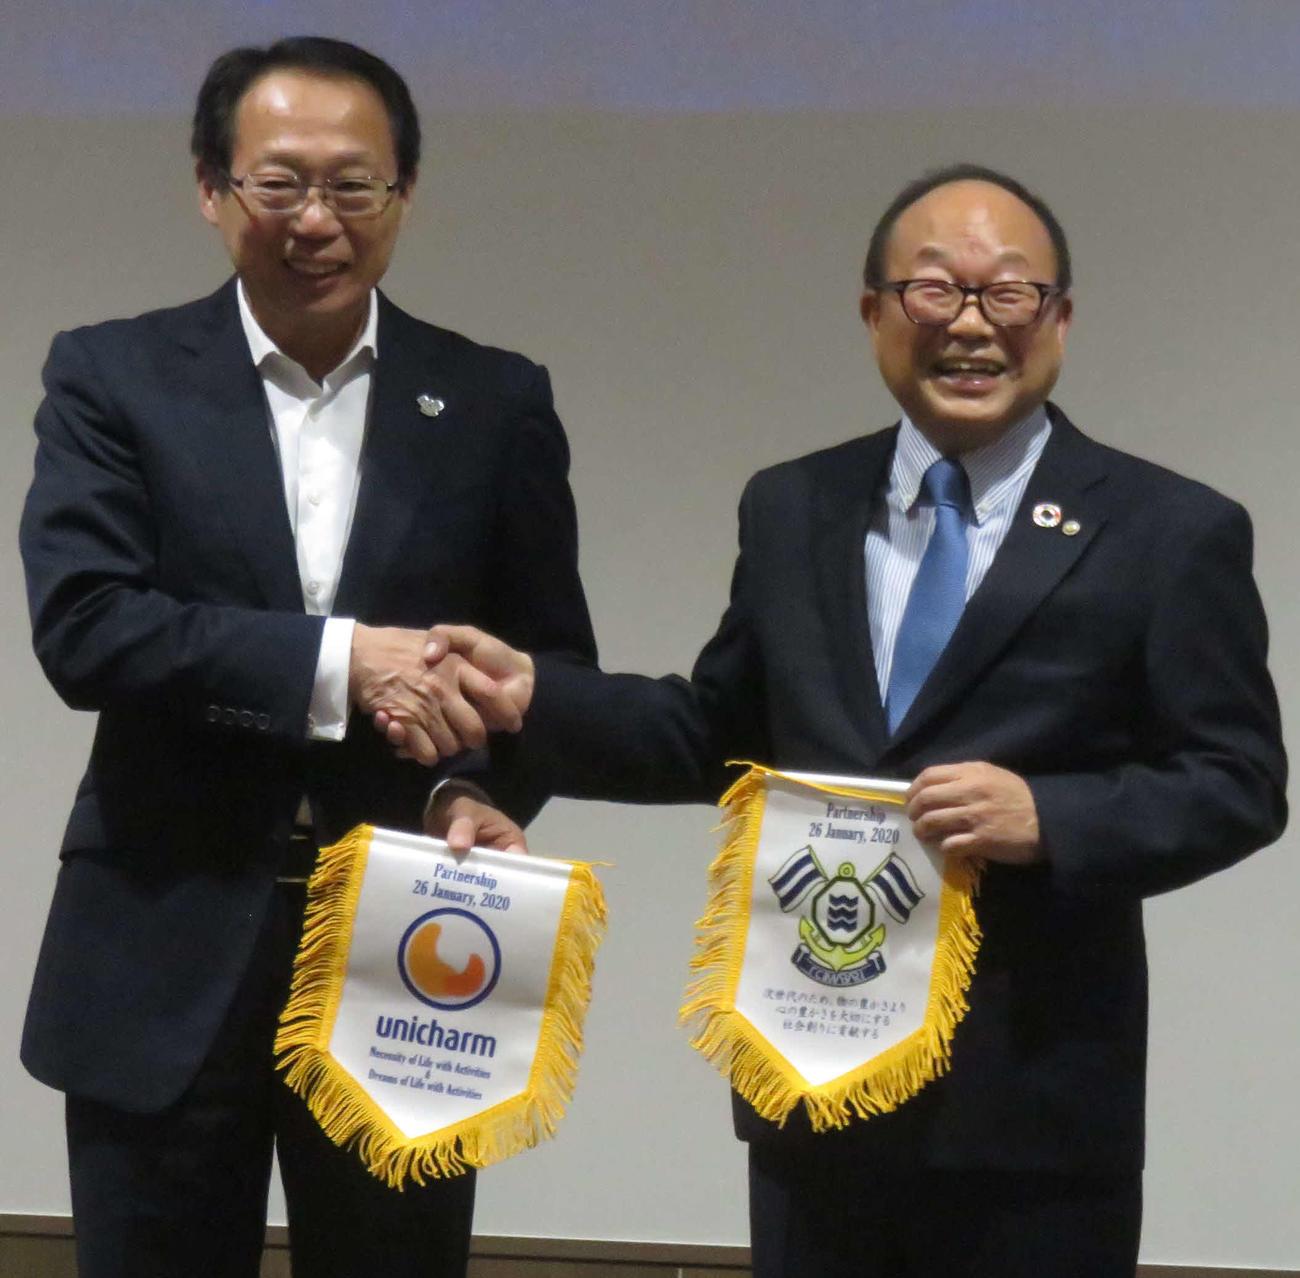 FC今治のシーズン方針発表会で今季のトップパートナーとなったユニ・チャームの石川副社長(右)とフラッグを交換する岡田オーナー